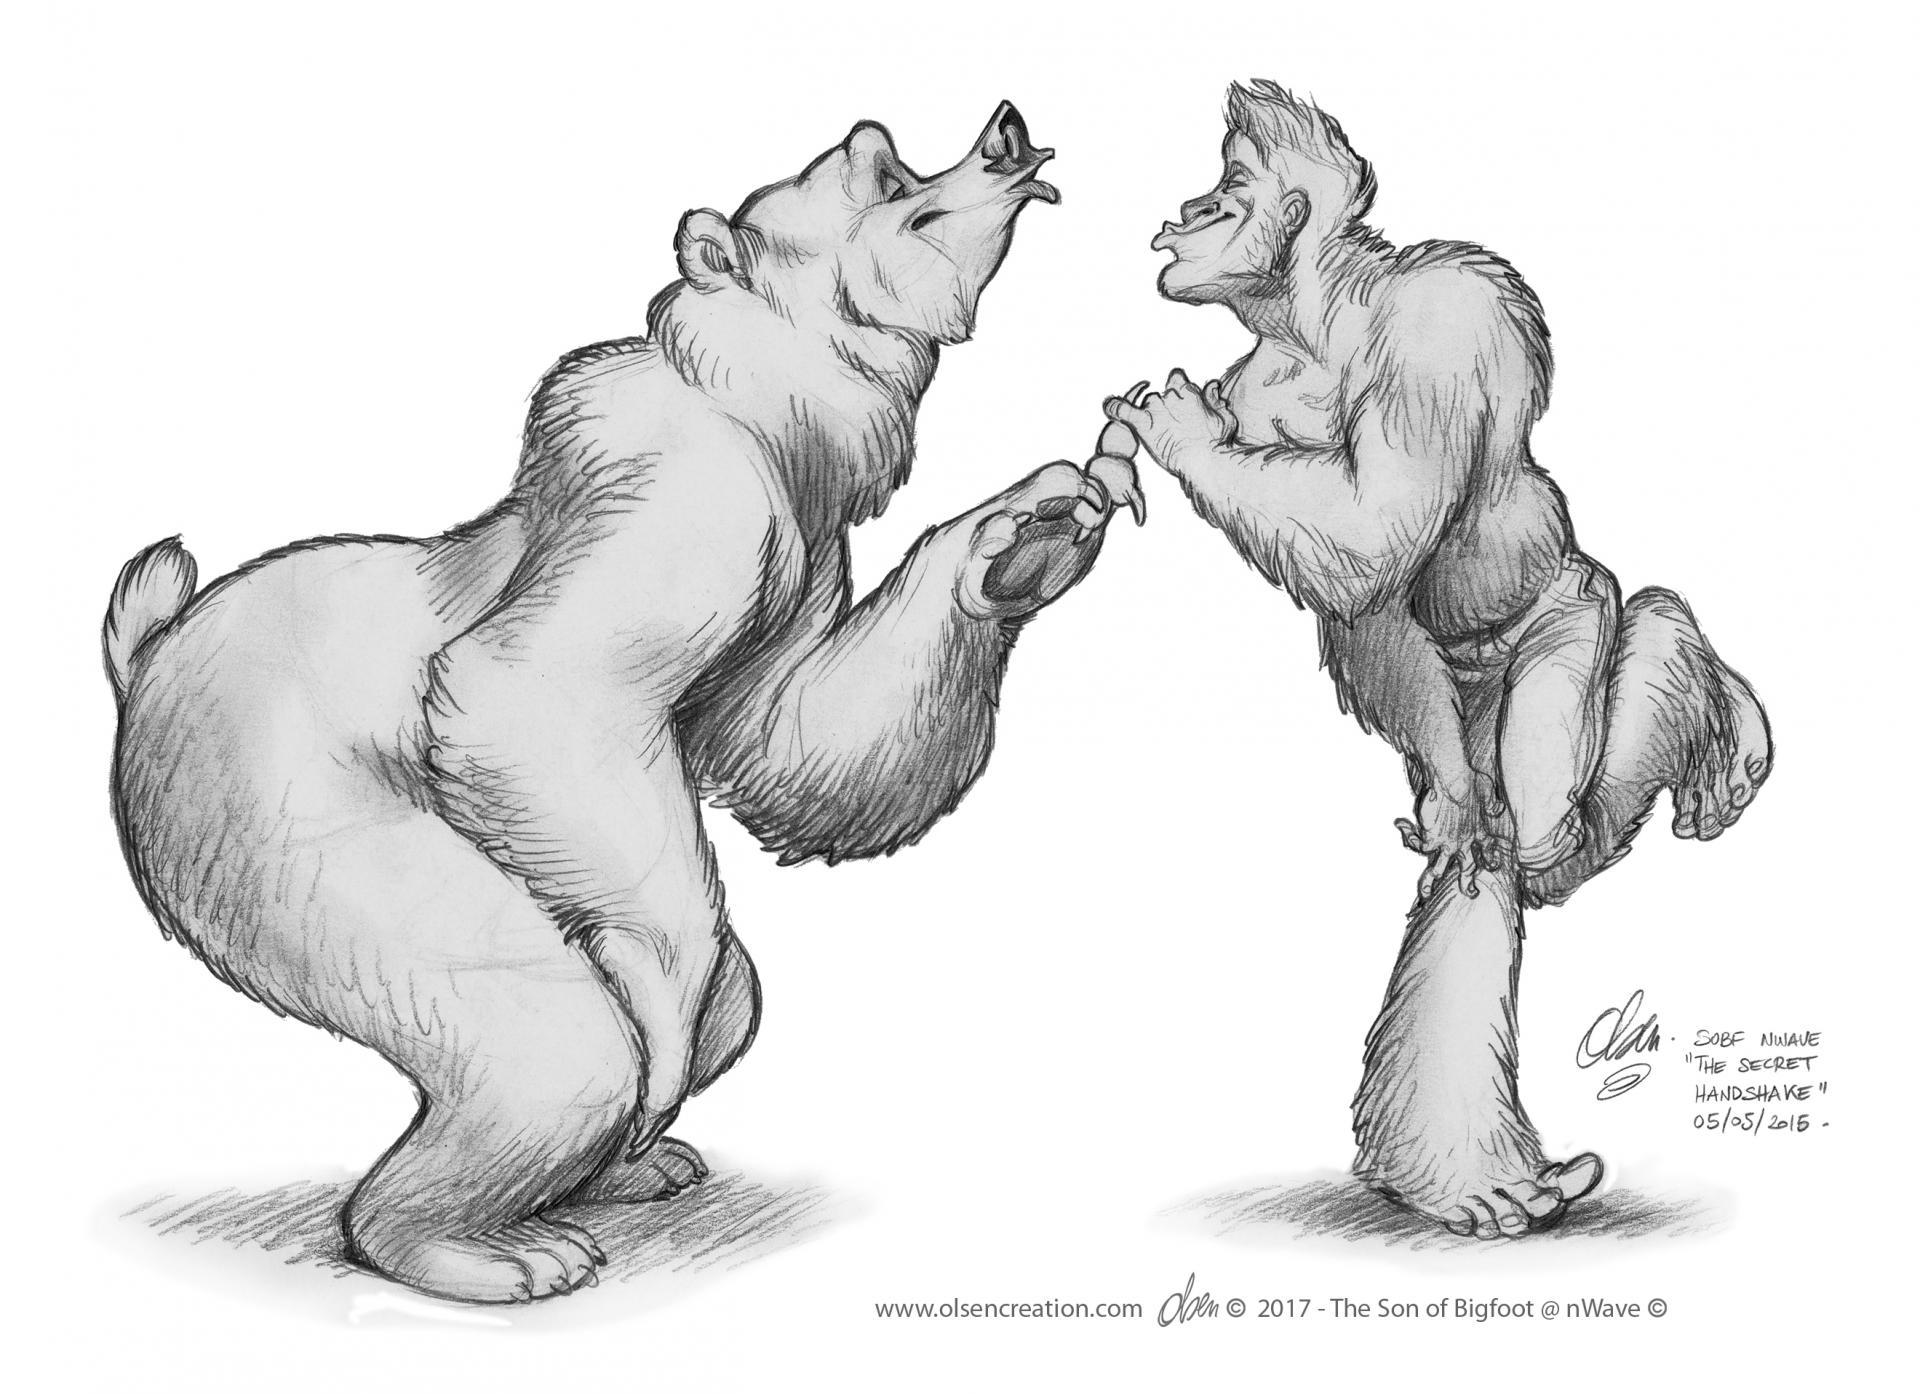 Wilbur and bigfoot the secret paws shake